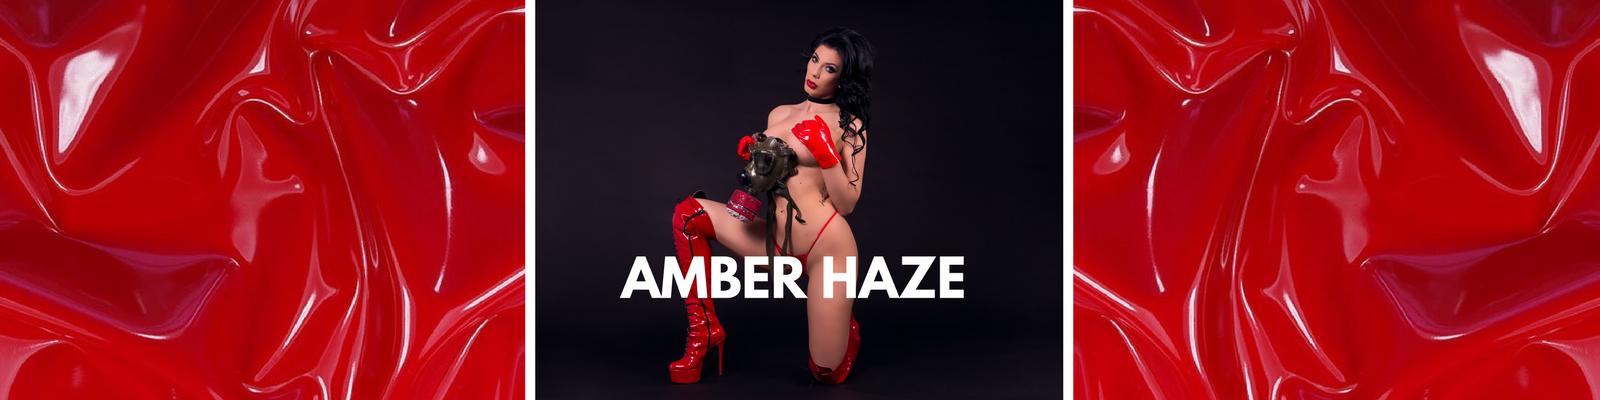 AMBER HAZE